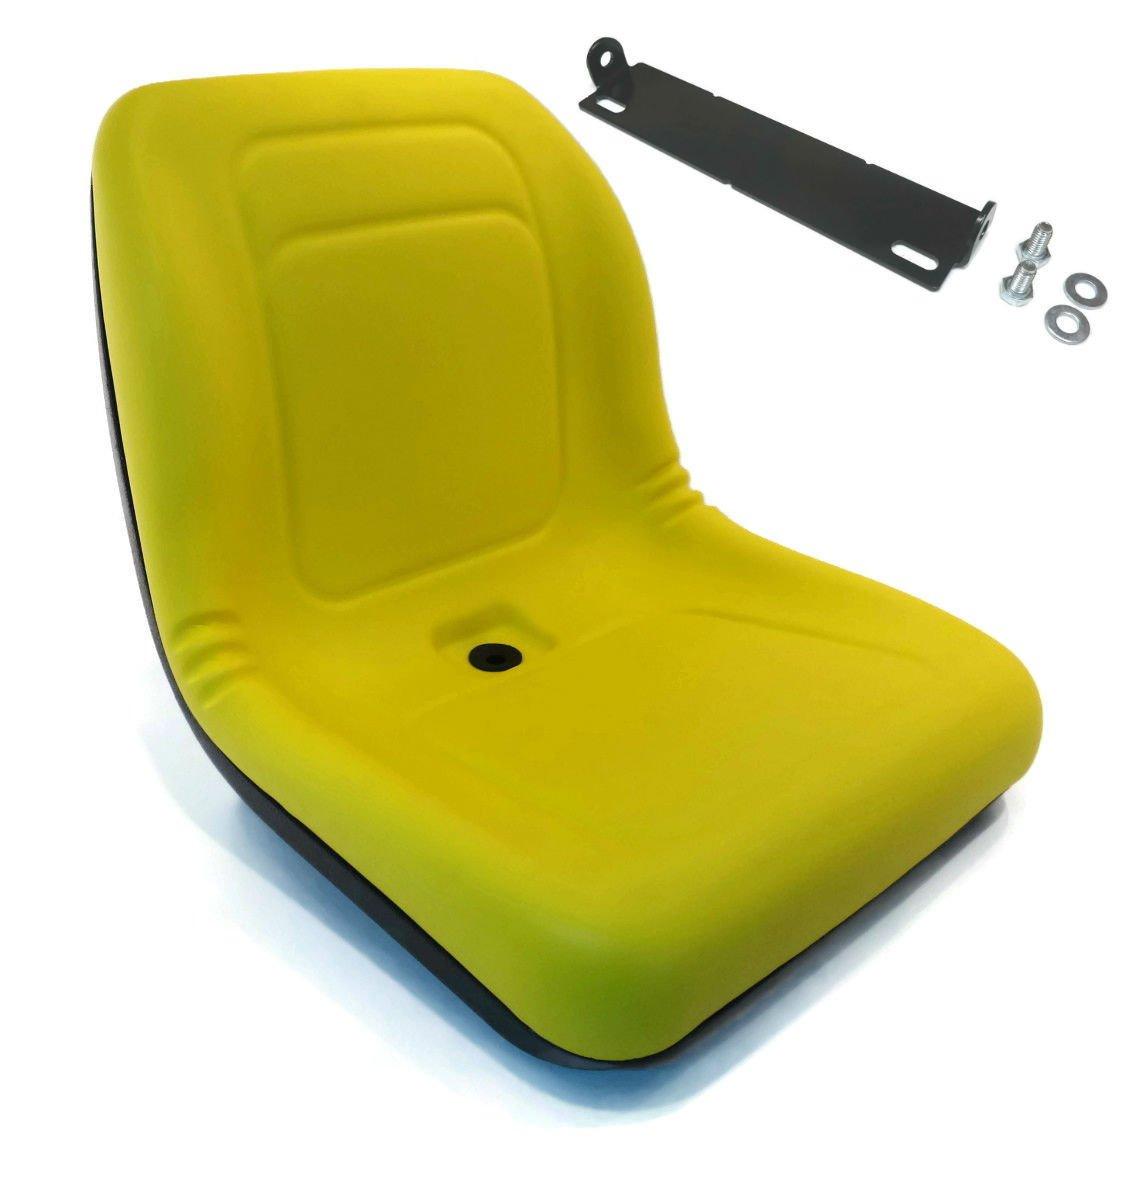 Yellow HIGH BACK SEAT w/ Pivot Rod Bracket John Deere GT242 GT245 GT262 GT275 supplier_id_theropshop, #UGEIO140251965627813